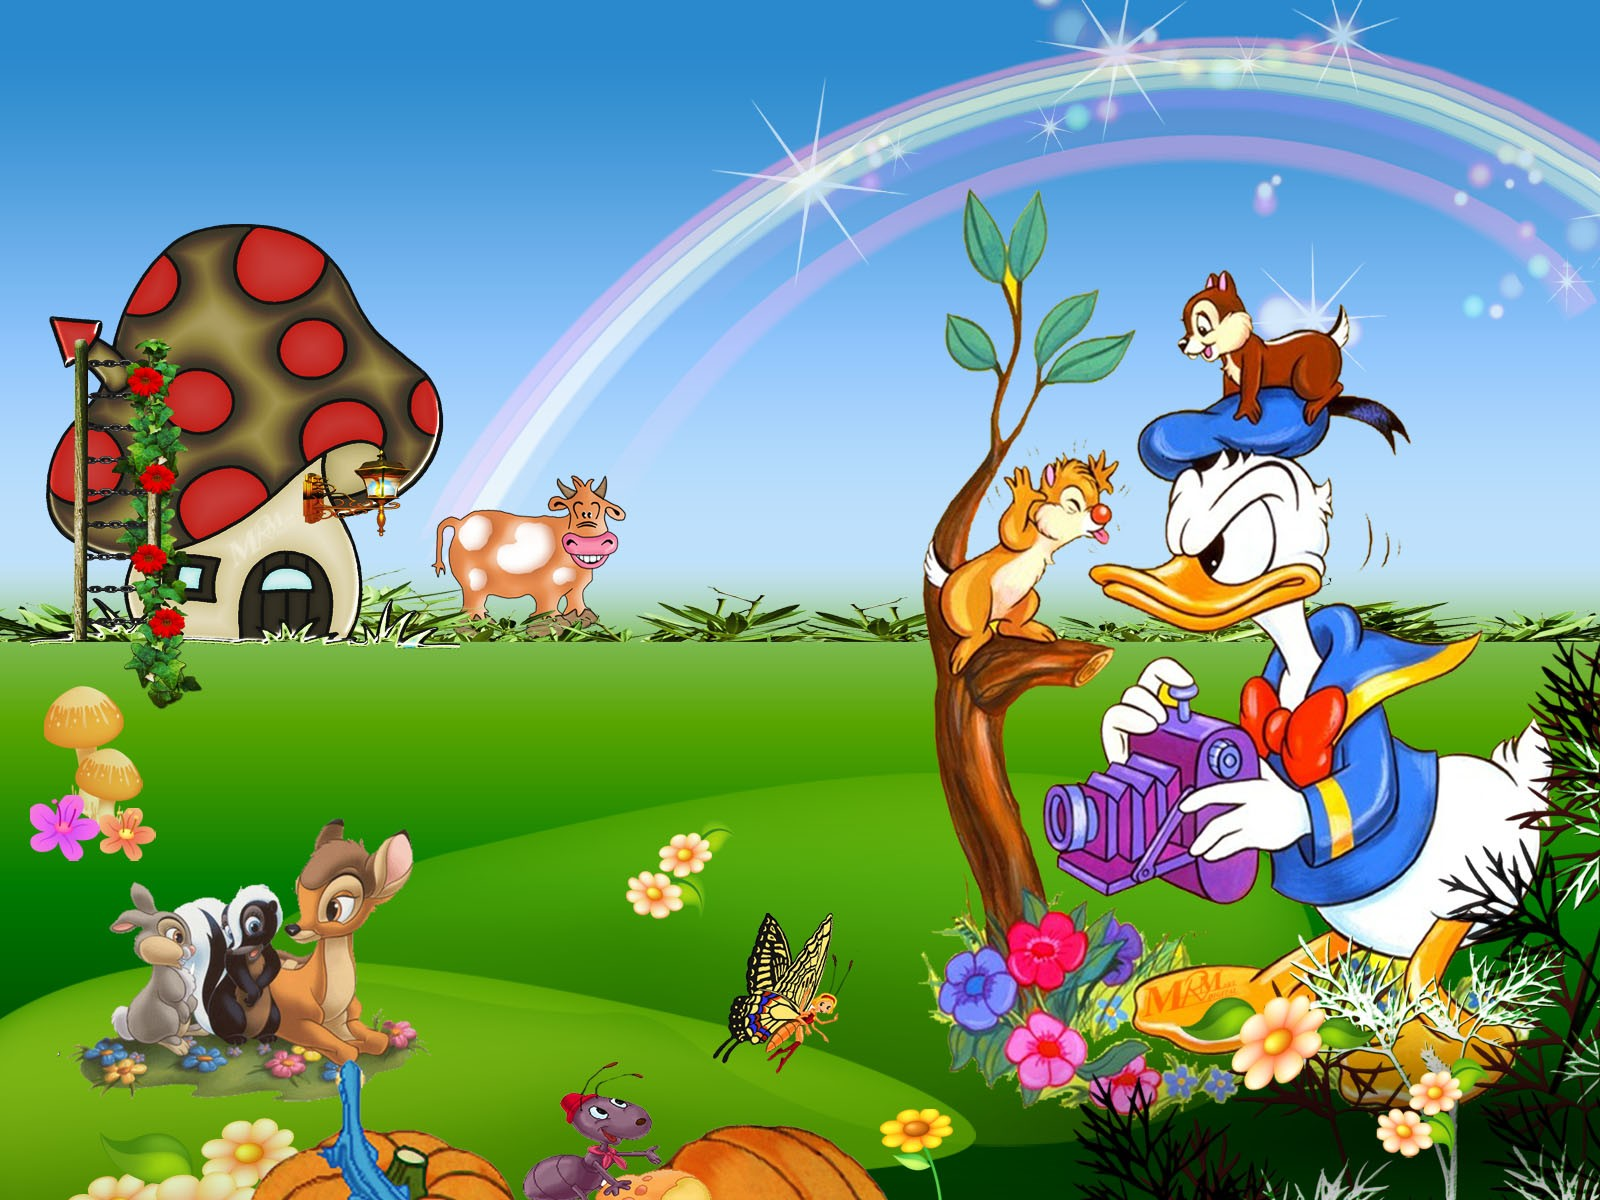 http://2.bp.blogspot.com/-BLbKhNFzY4g/ULFKF3k6UmI/AAAAAAAAASc/jYrXccrNi0M/s1600/cartoon-hd-wallpapers-latest.jpg